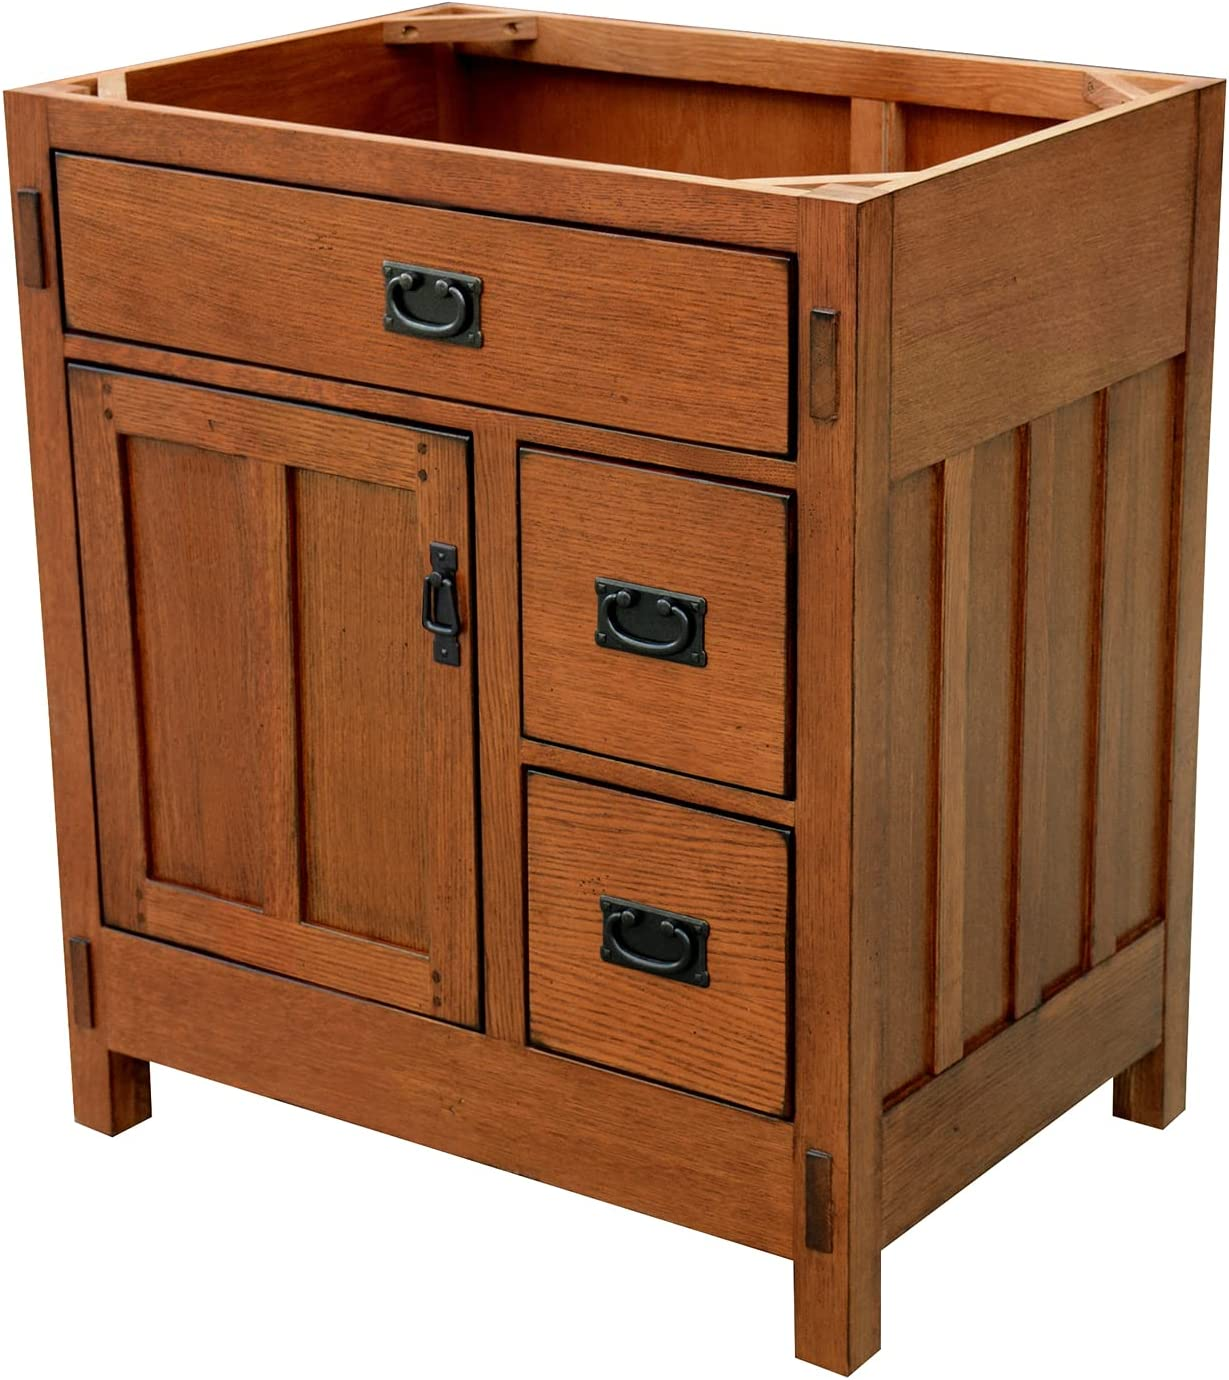 Sagehill Designs American Craftsman 30 Bathroom Vanity Base Rustic Oak Finish Amazon Com